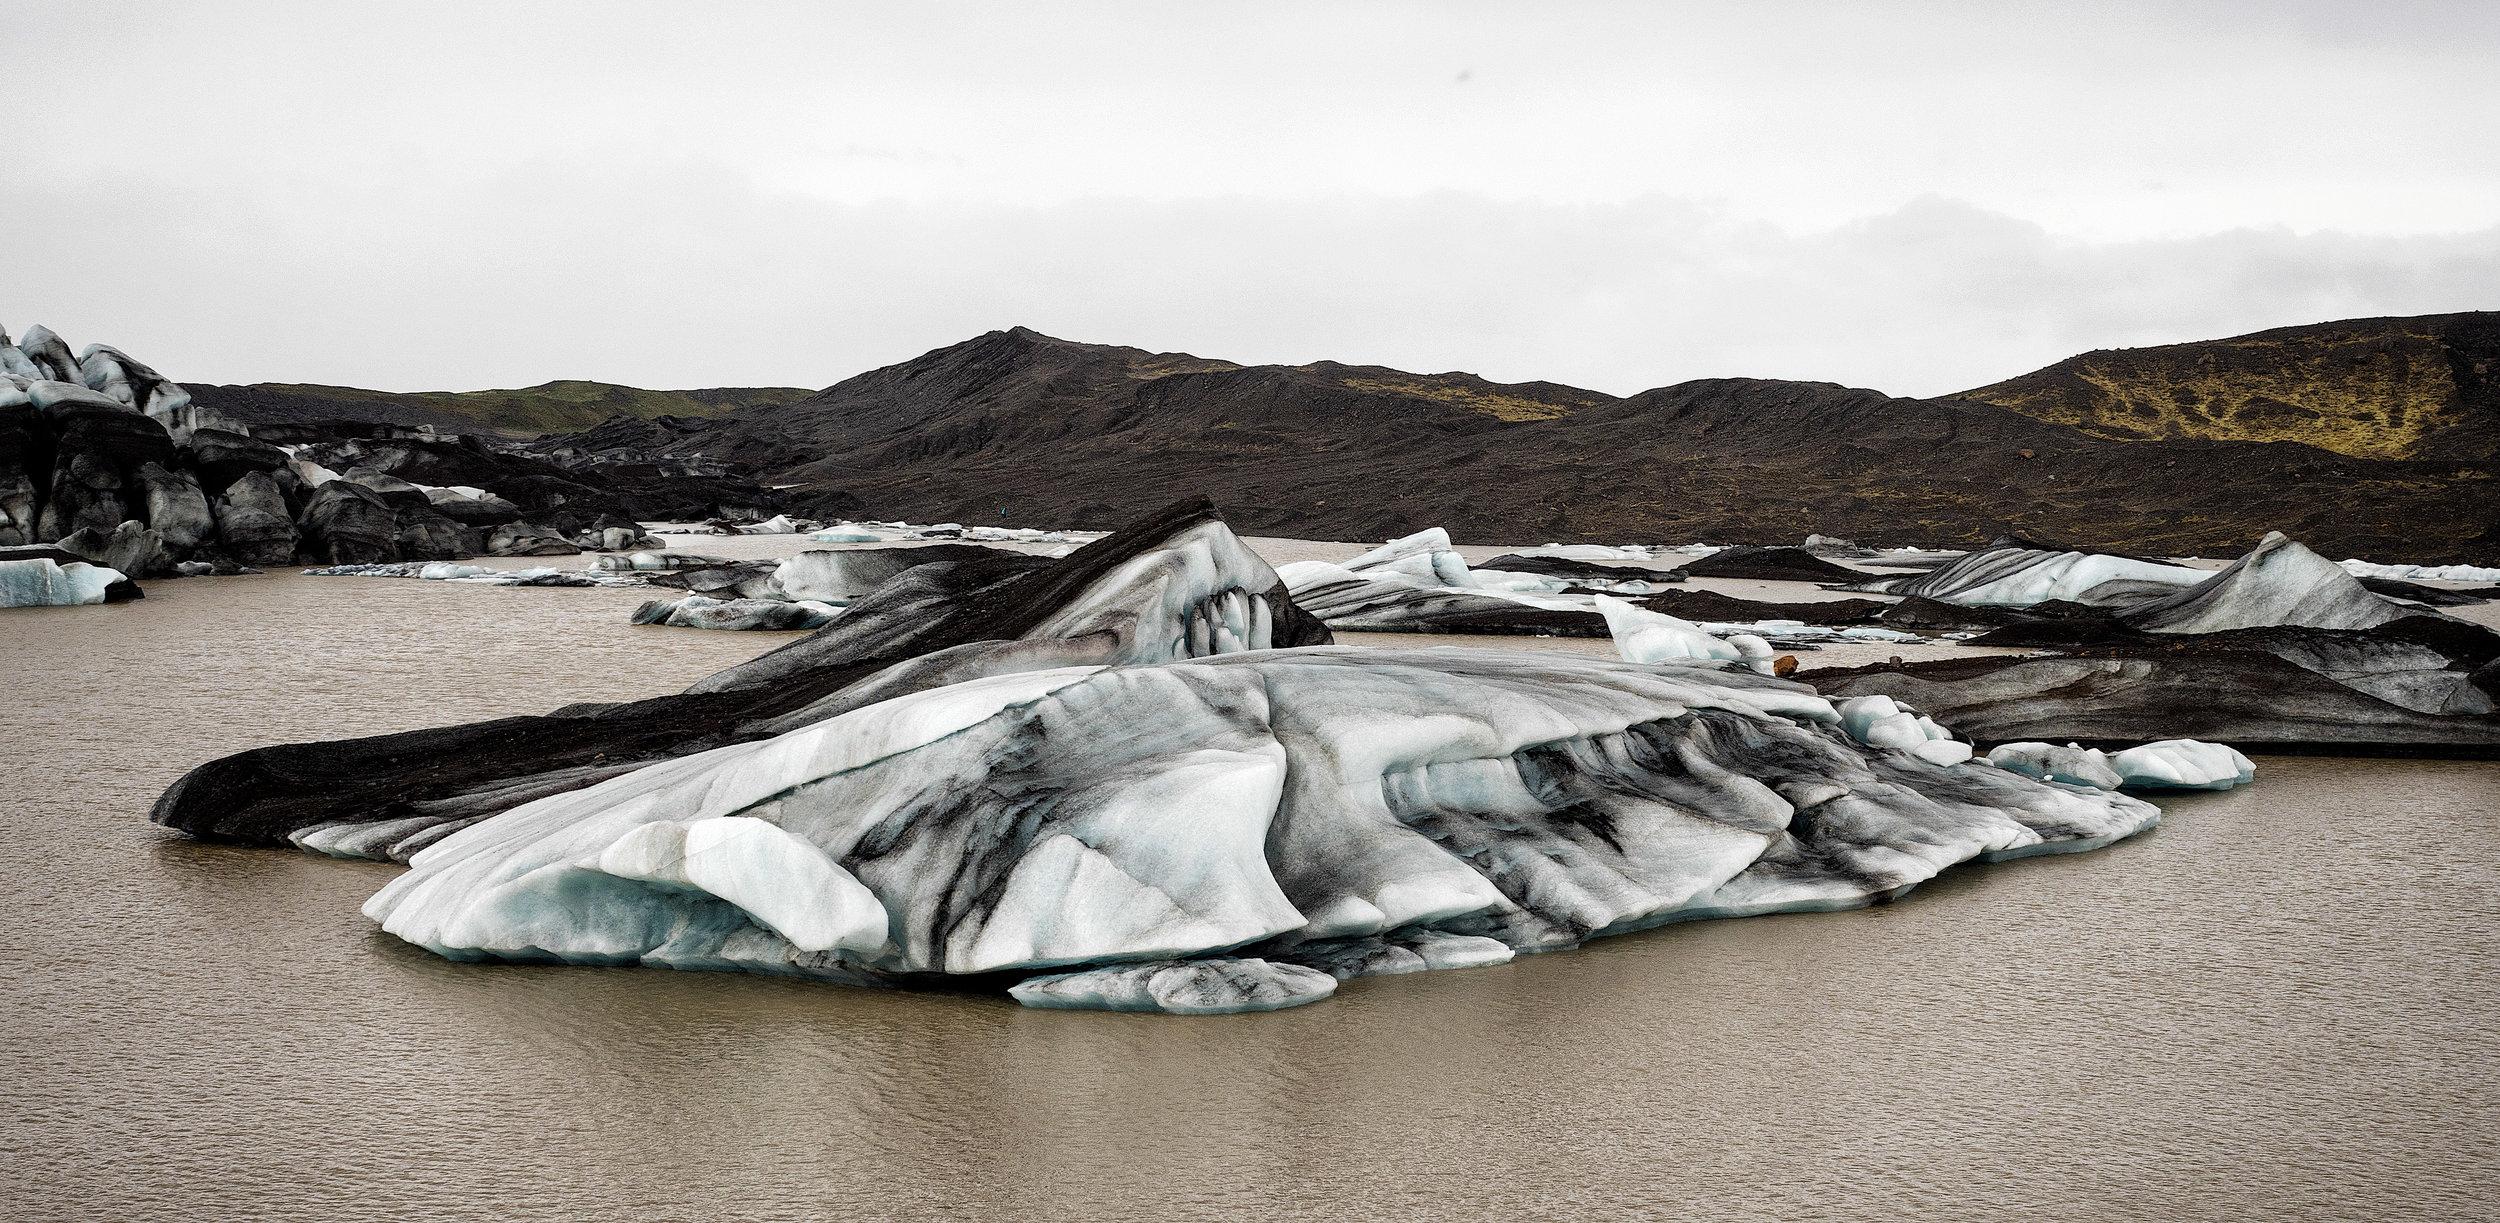 Another broken piece of Glacier